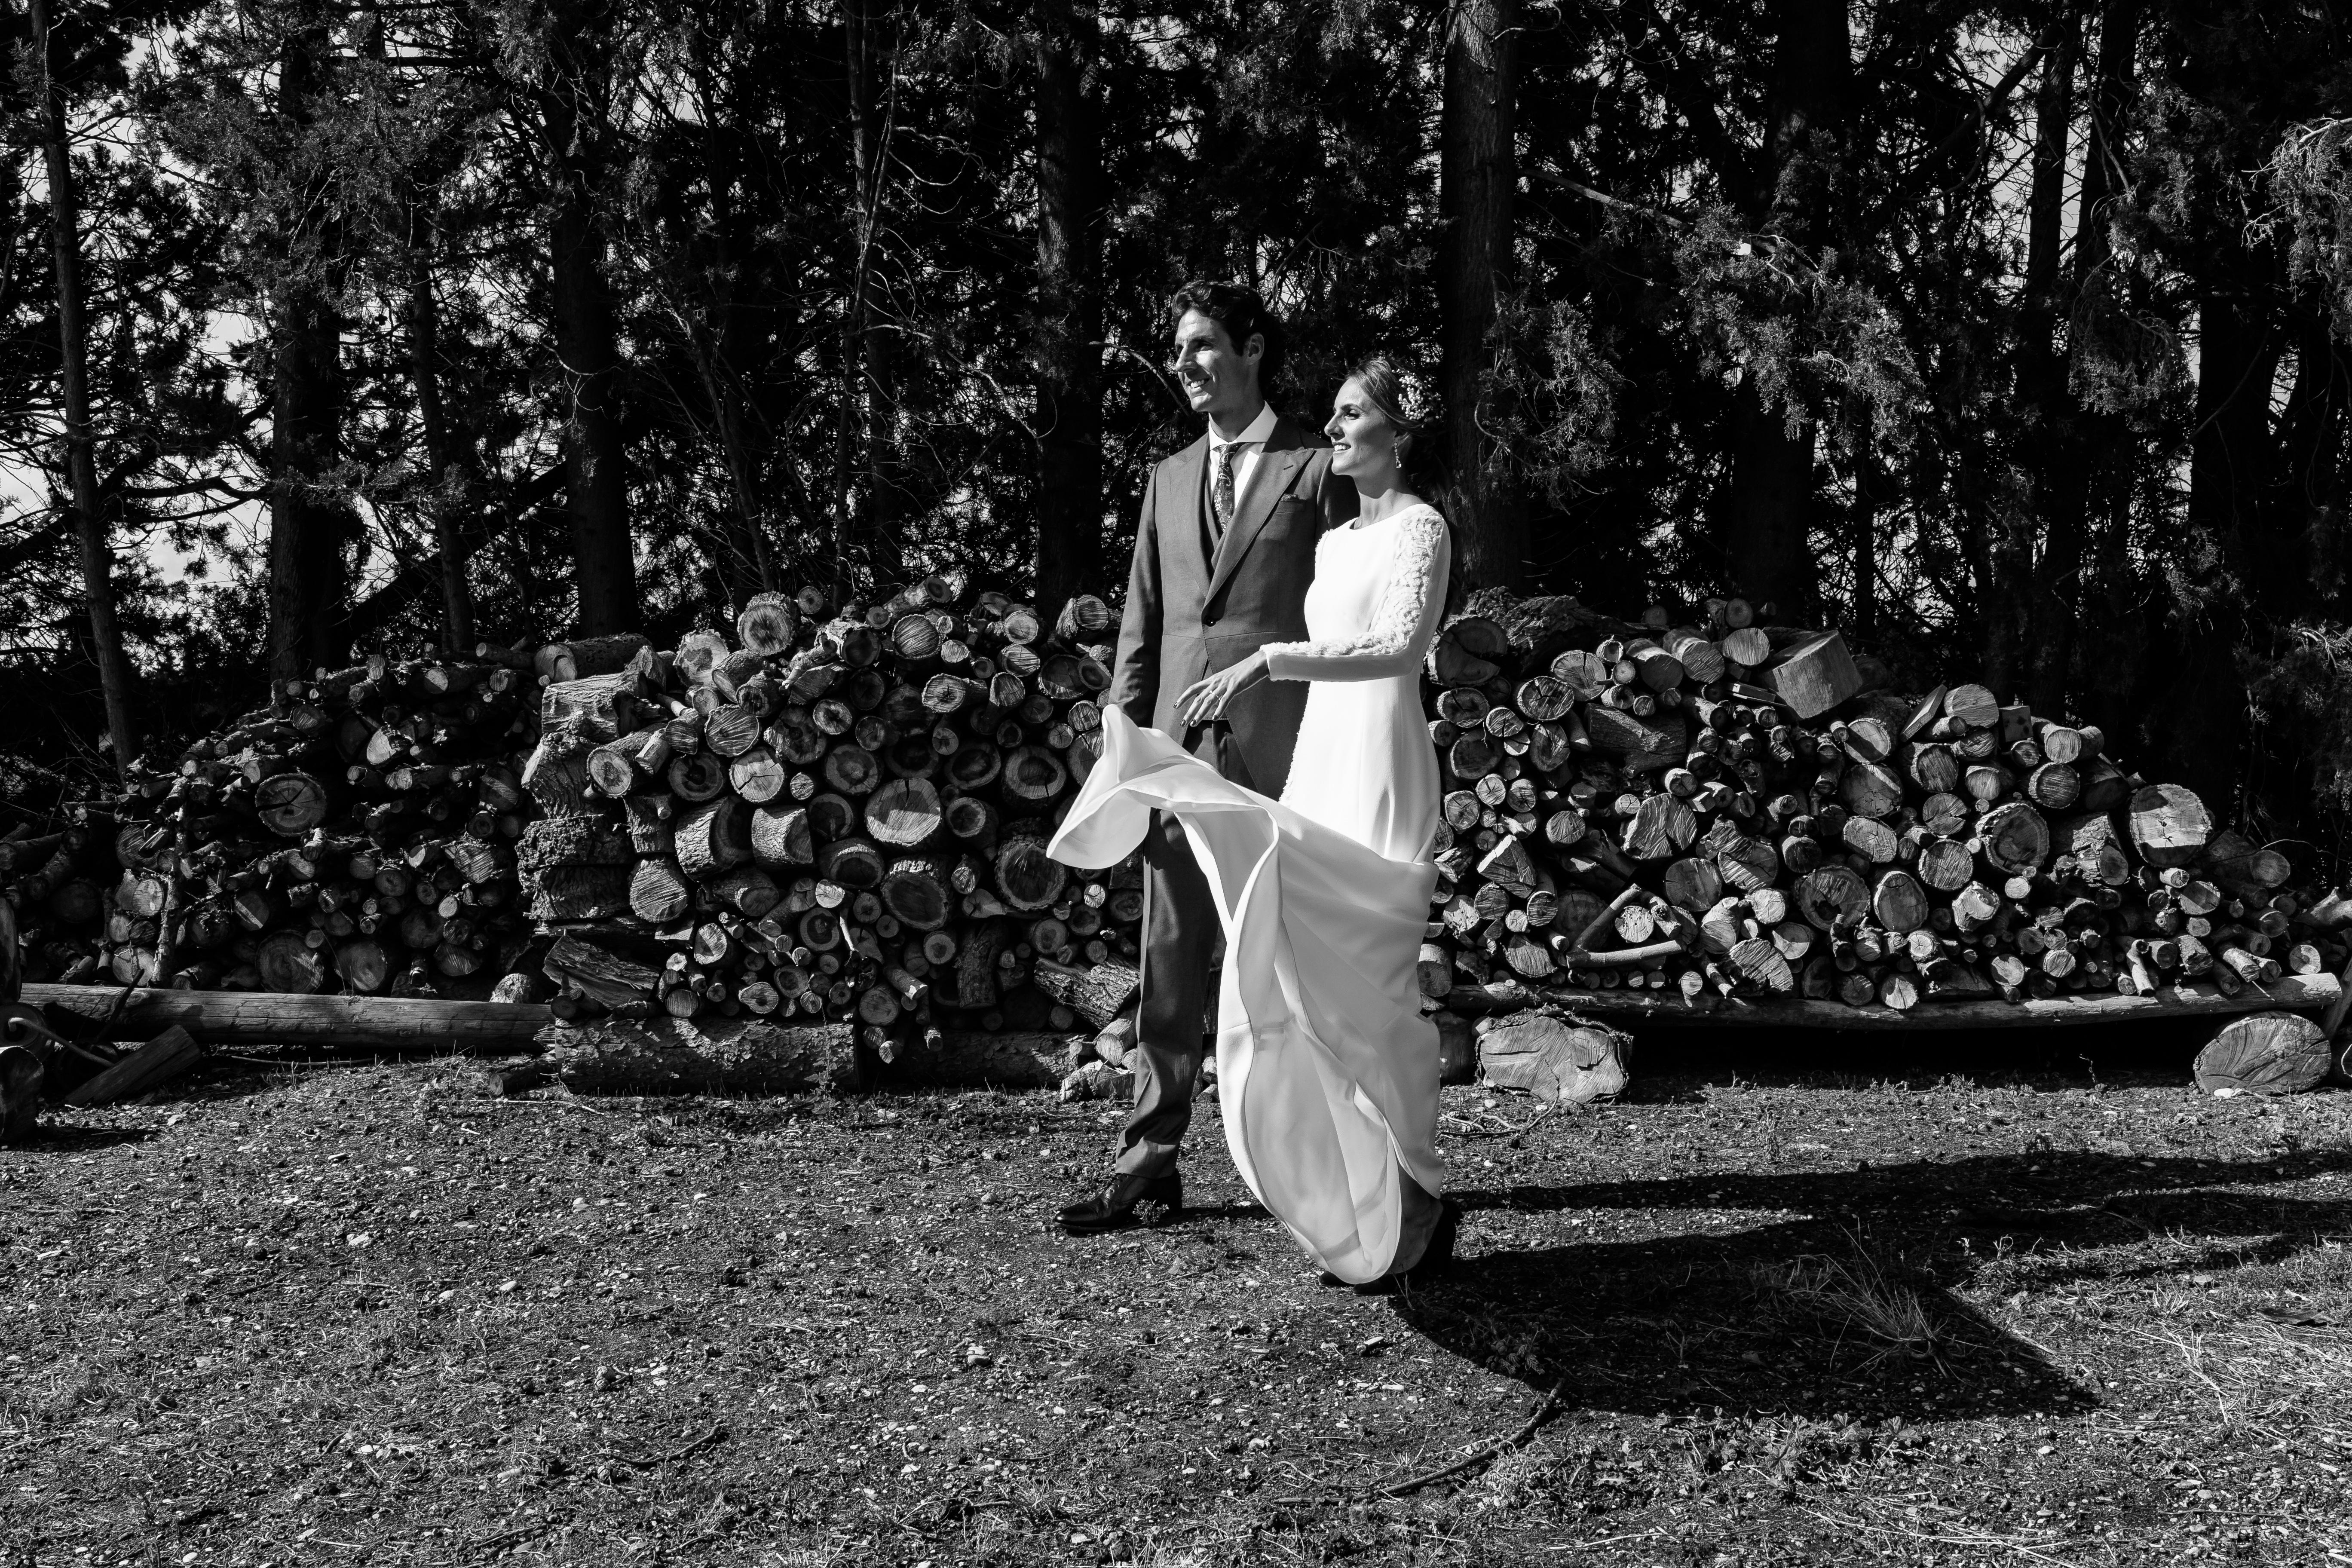 mandarina weddig, fotografos de boda, fotografo boda soria, fotografo boda barcelona, fotografo boda Madrid, fotografo boda lerida, fotografo boda Huesca_40